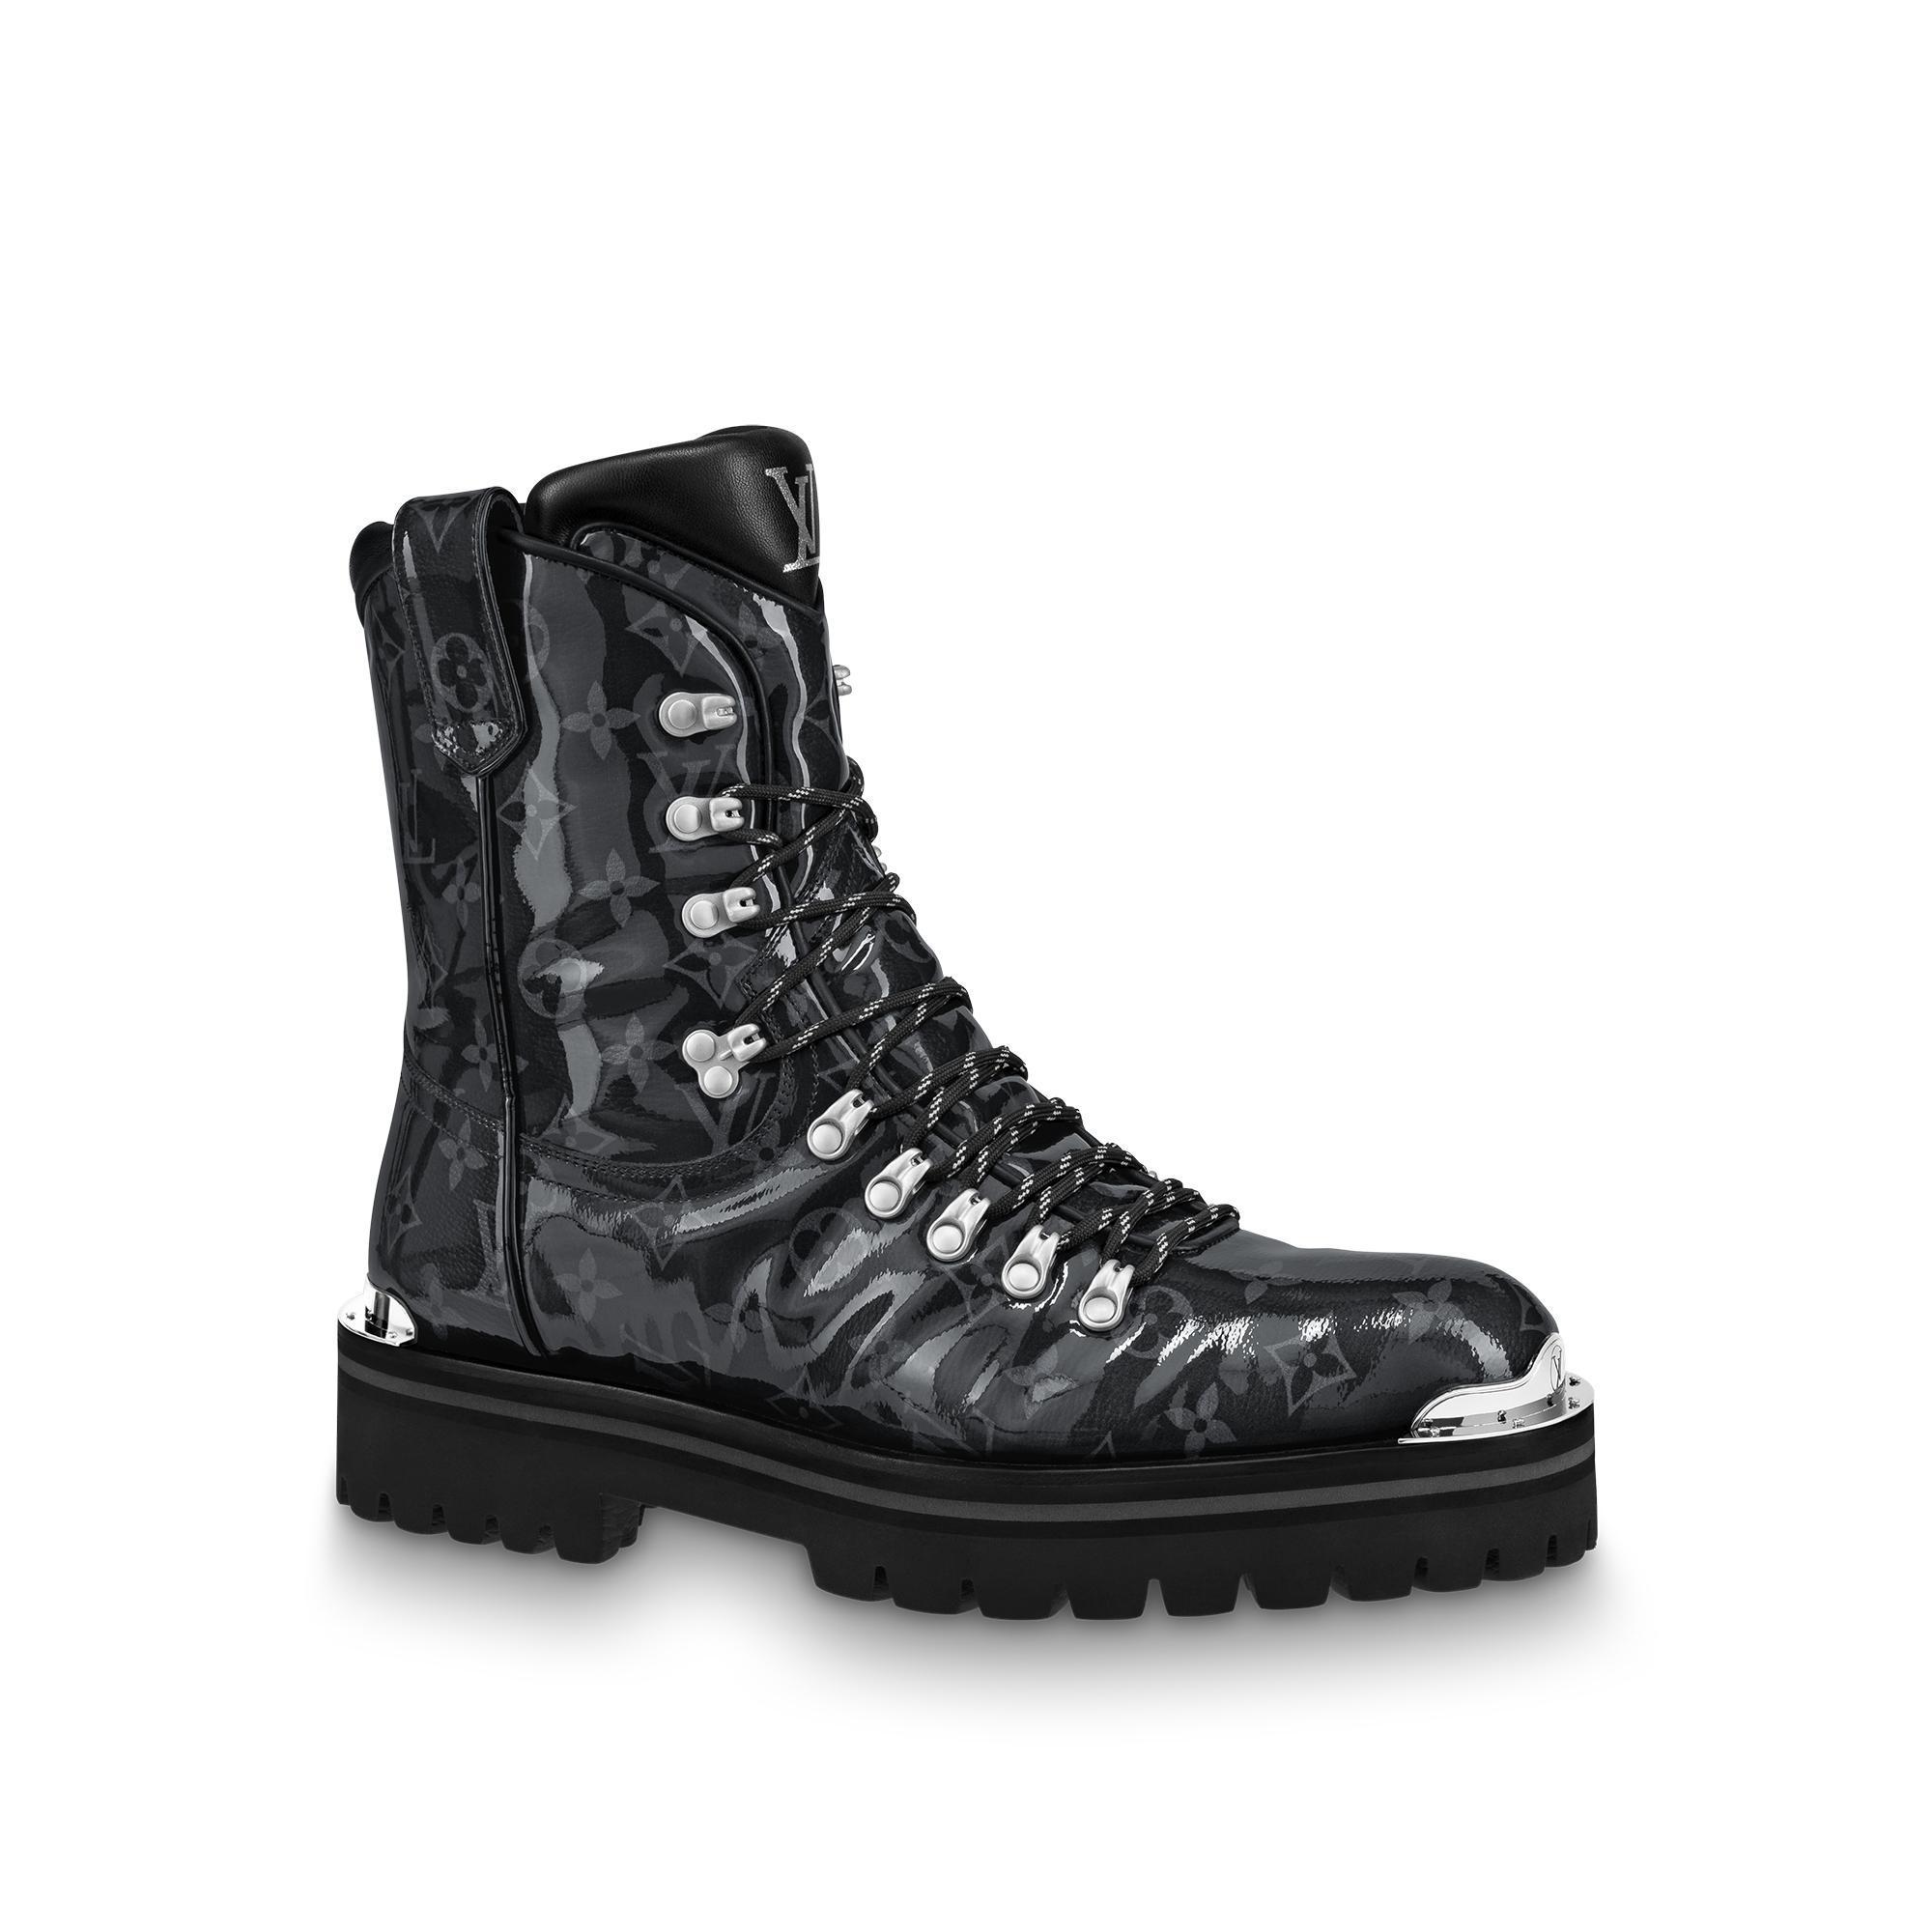 37143ab25db8 Louis Vuitton Lv Outland Ankle Boot